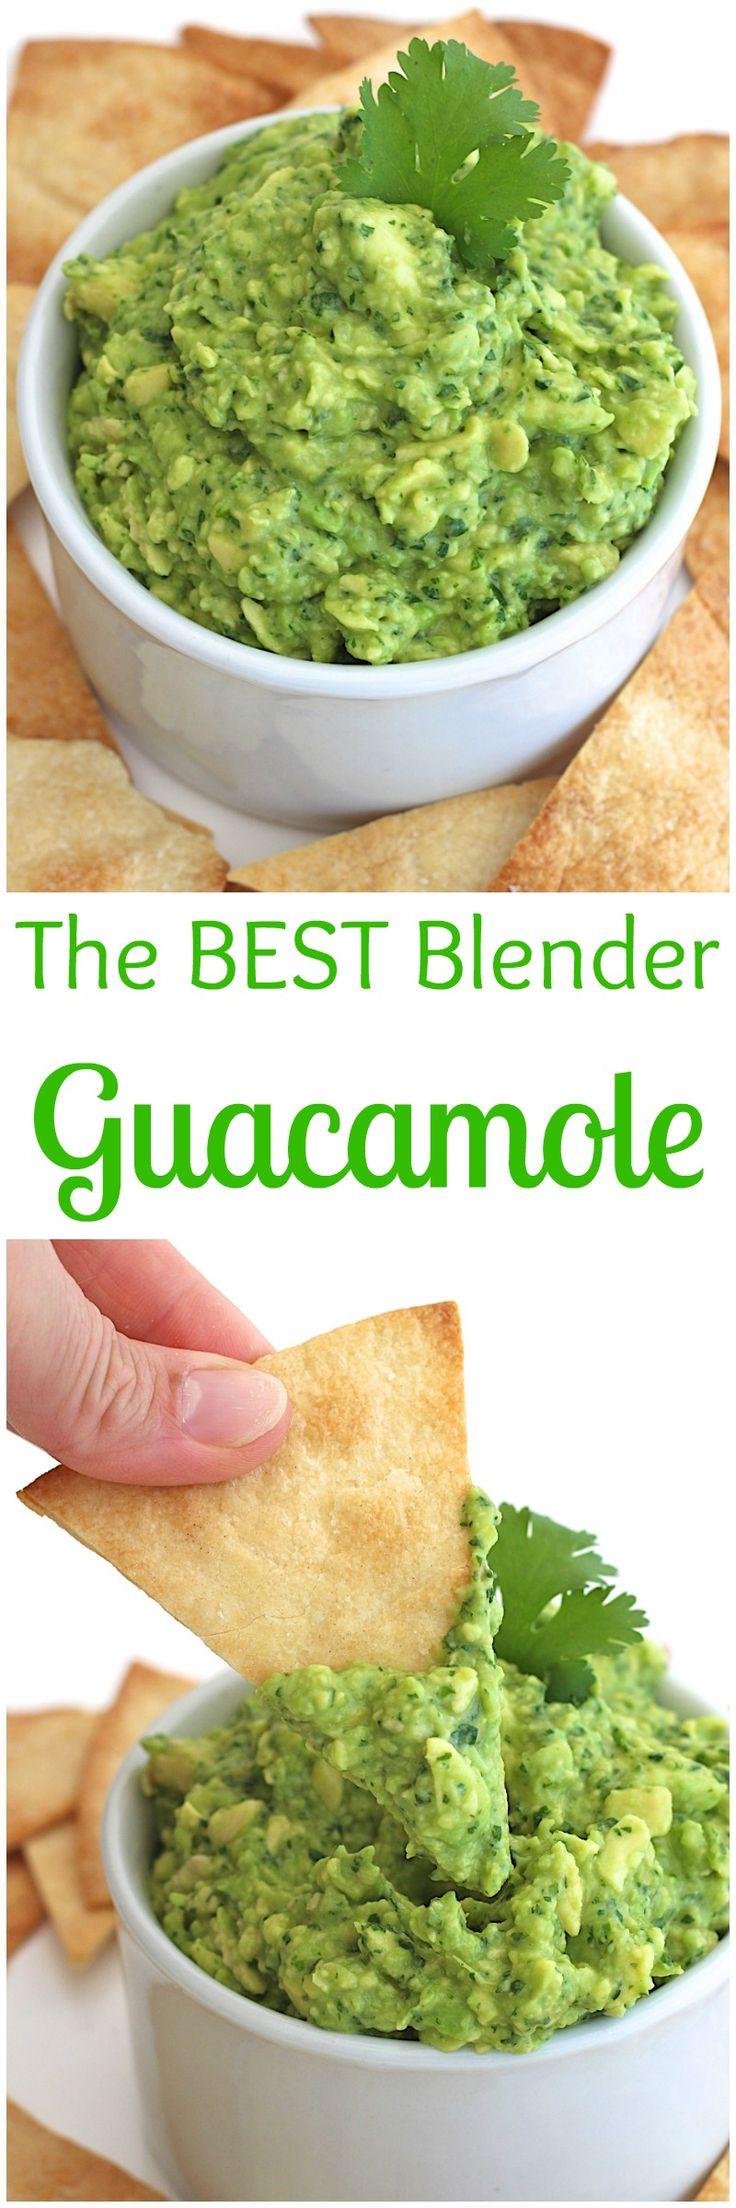 The BEST Blender Guacamole!